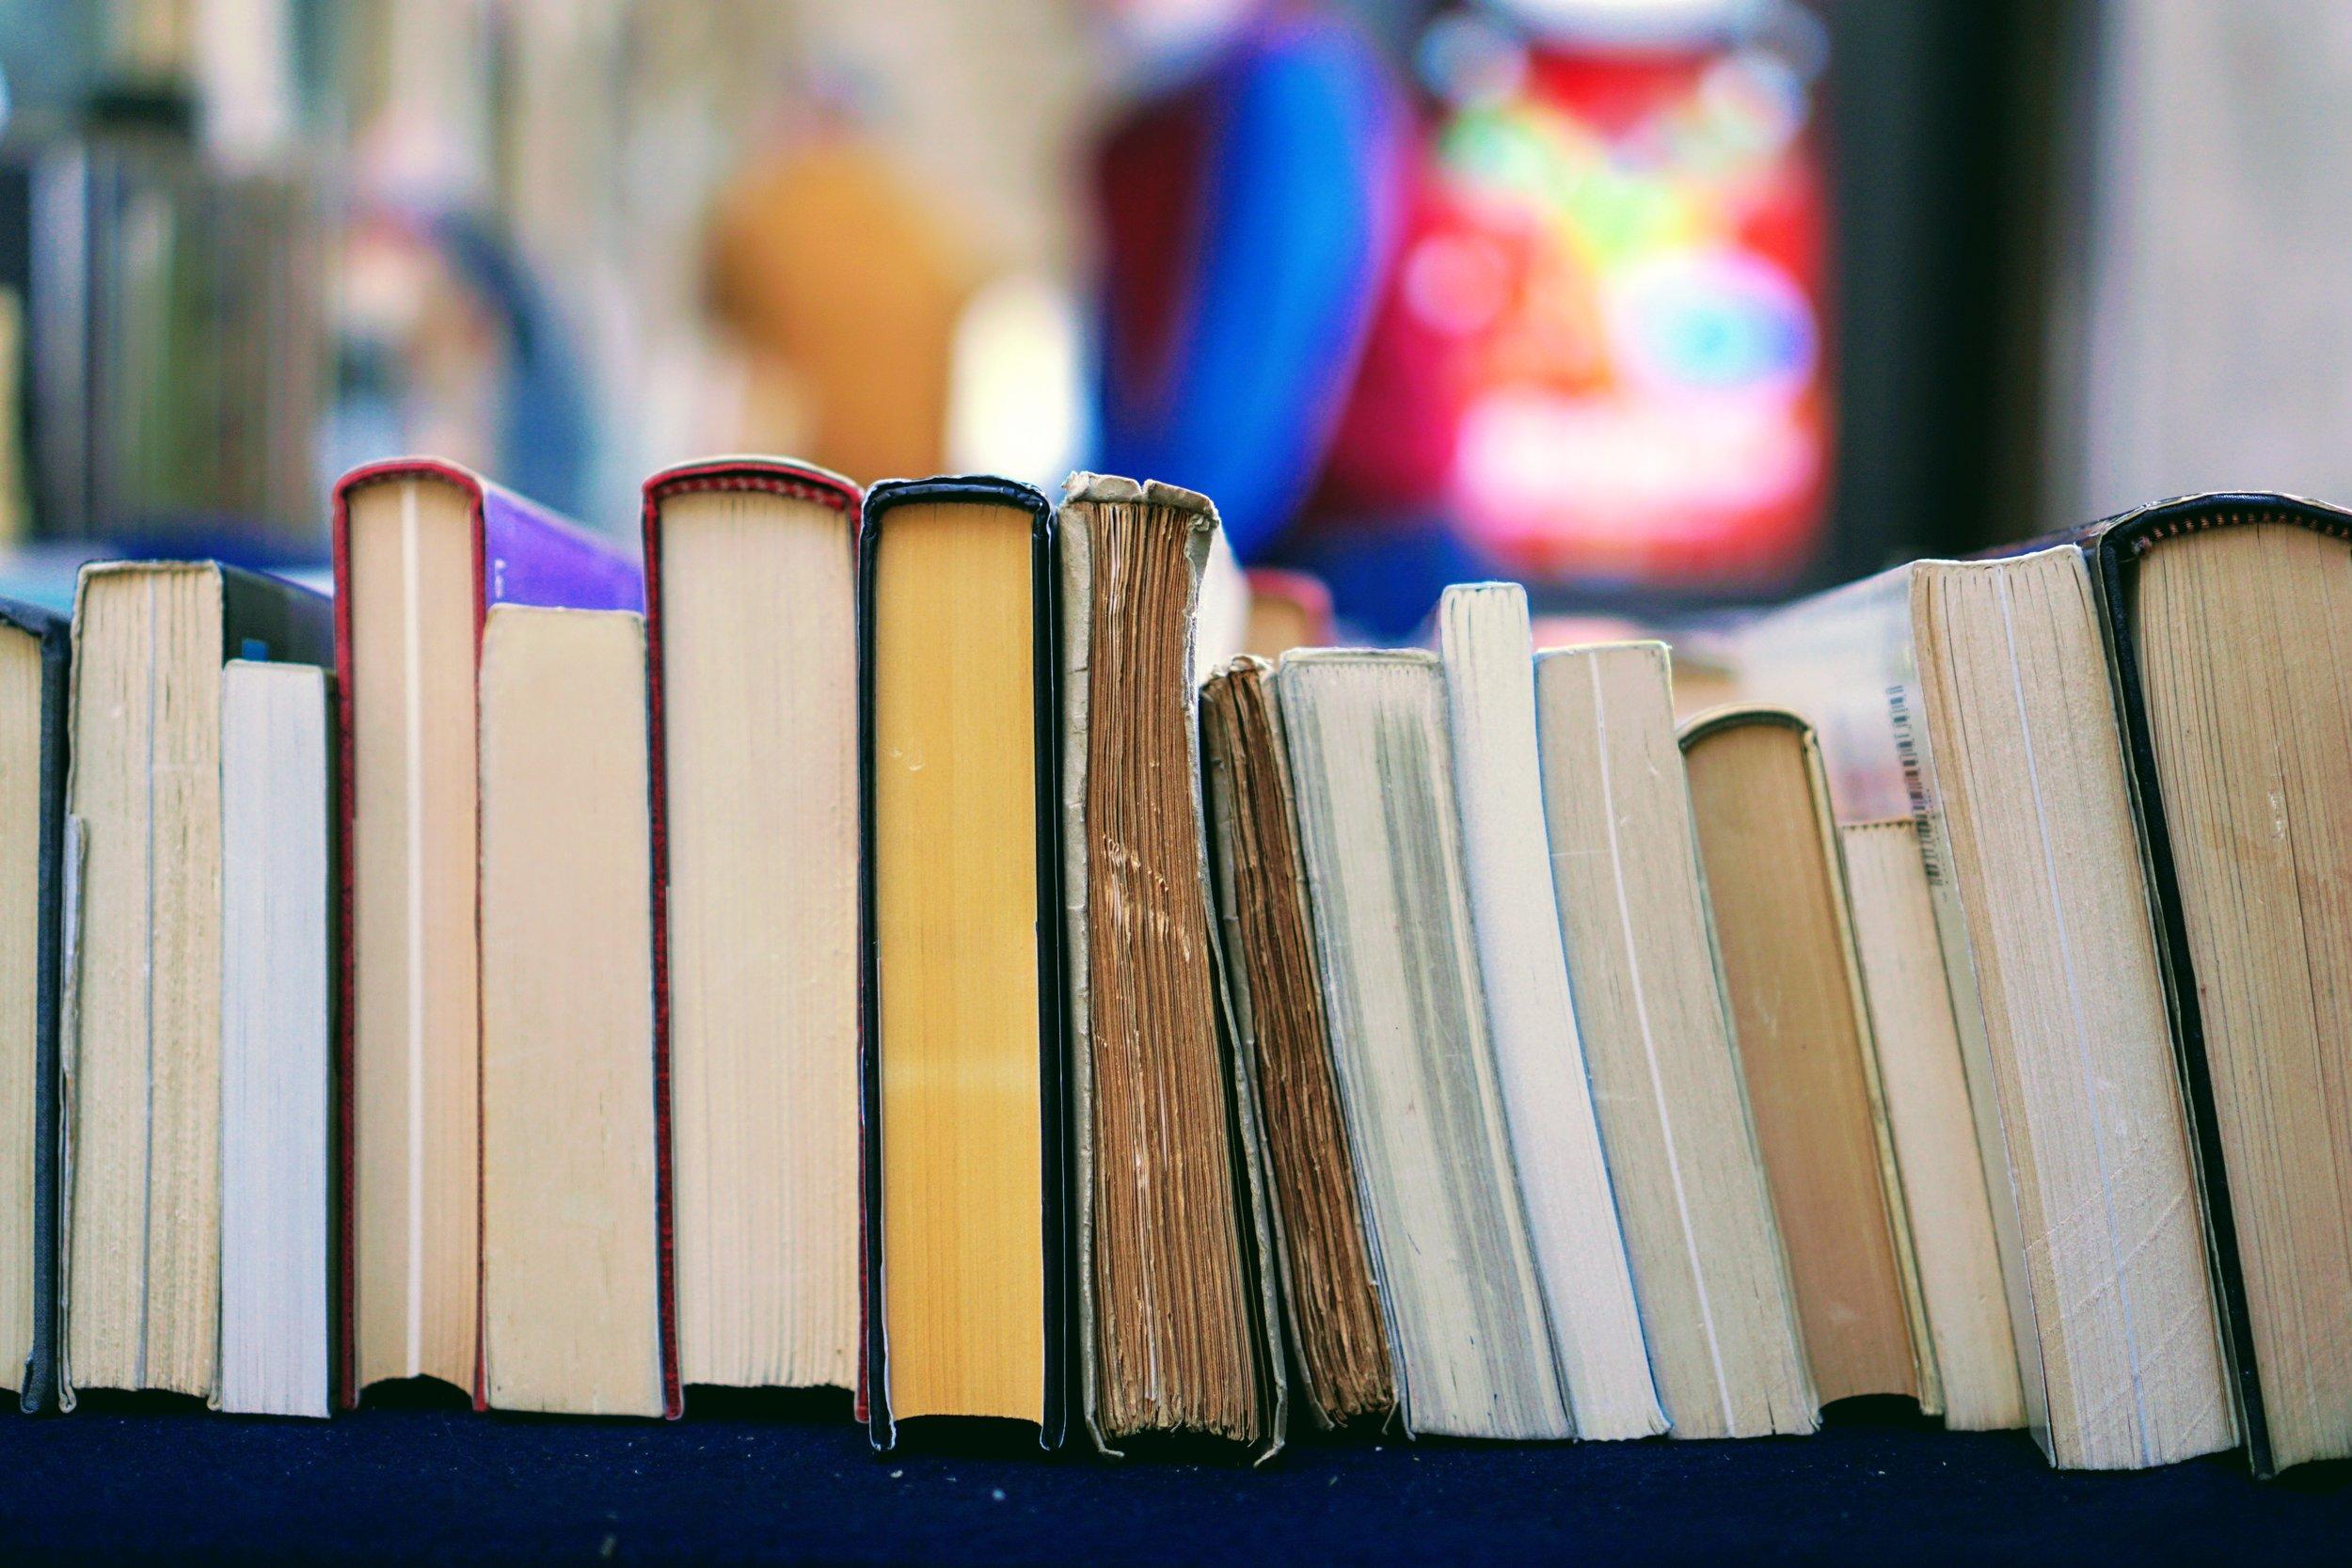 Monika_gold_truemove_pdx_library.jpg